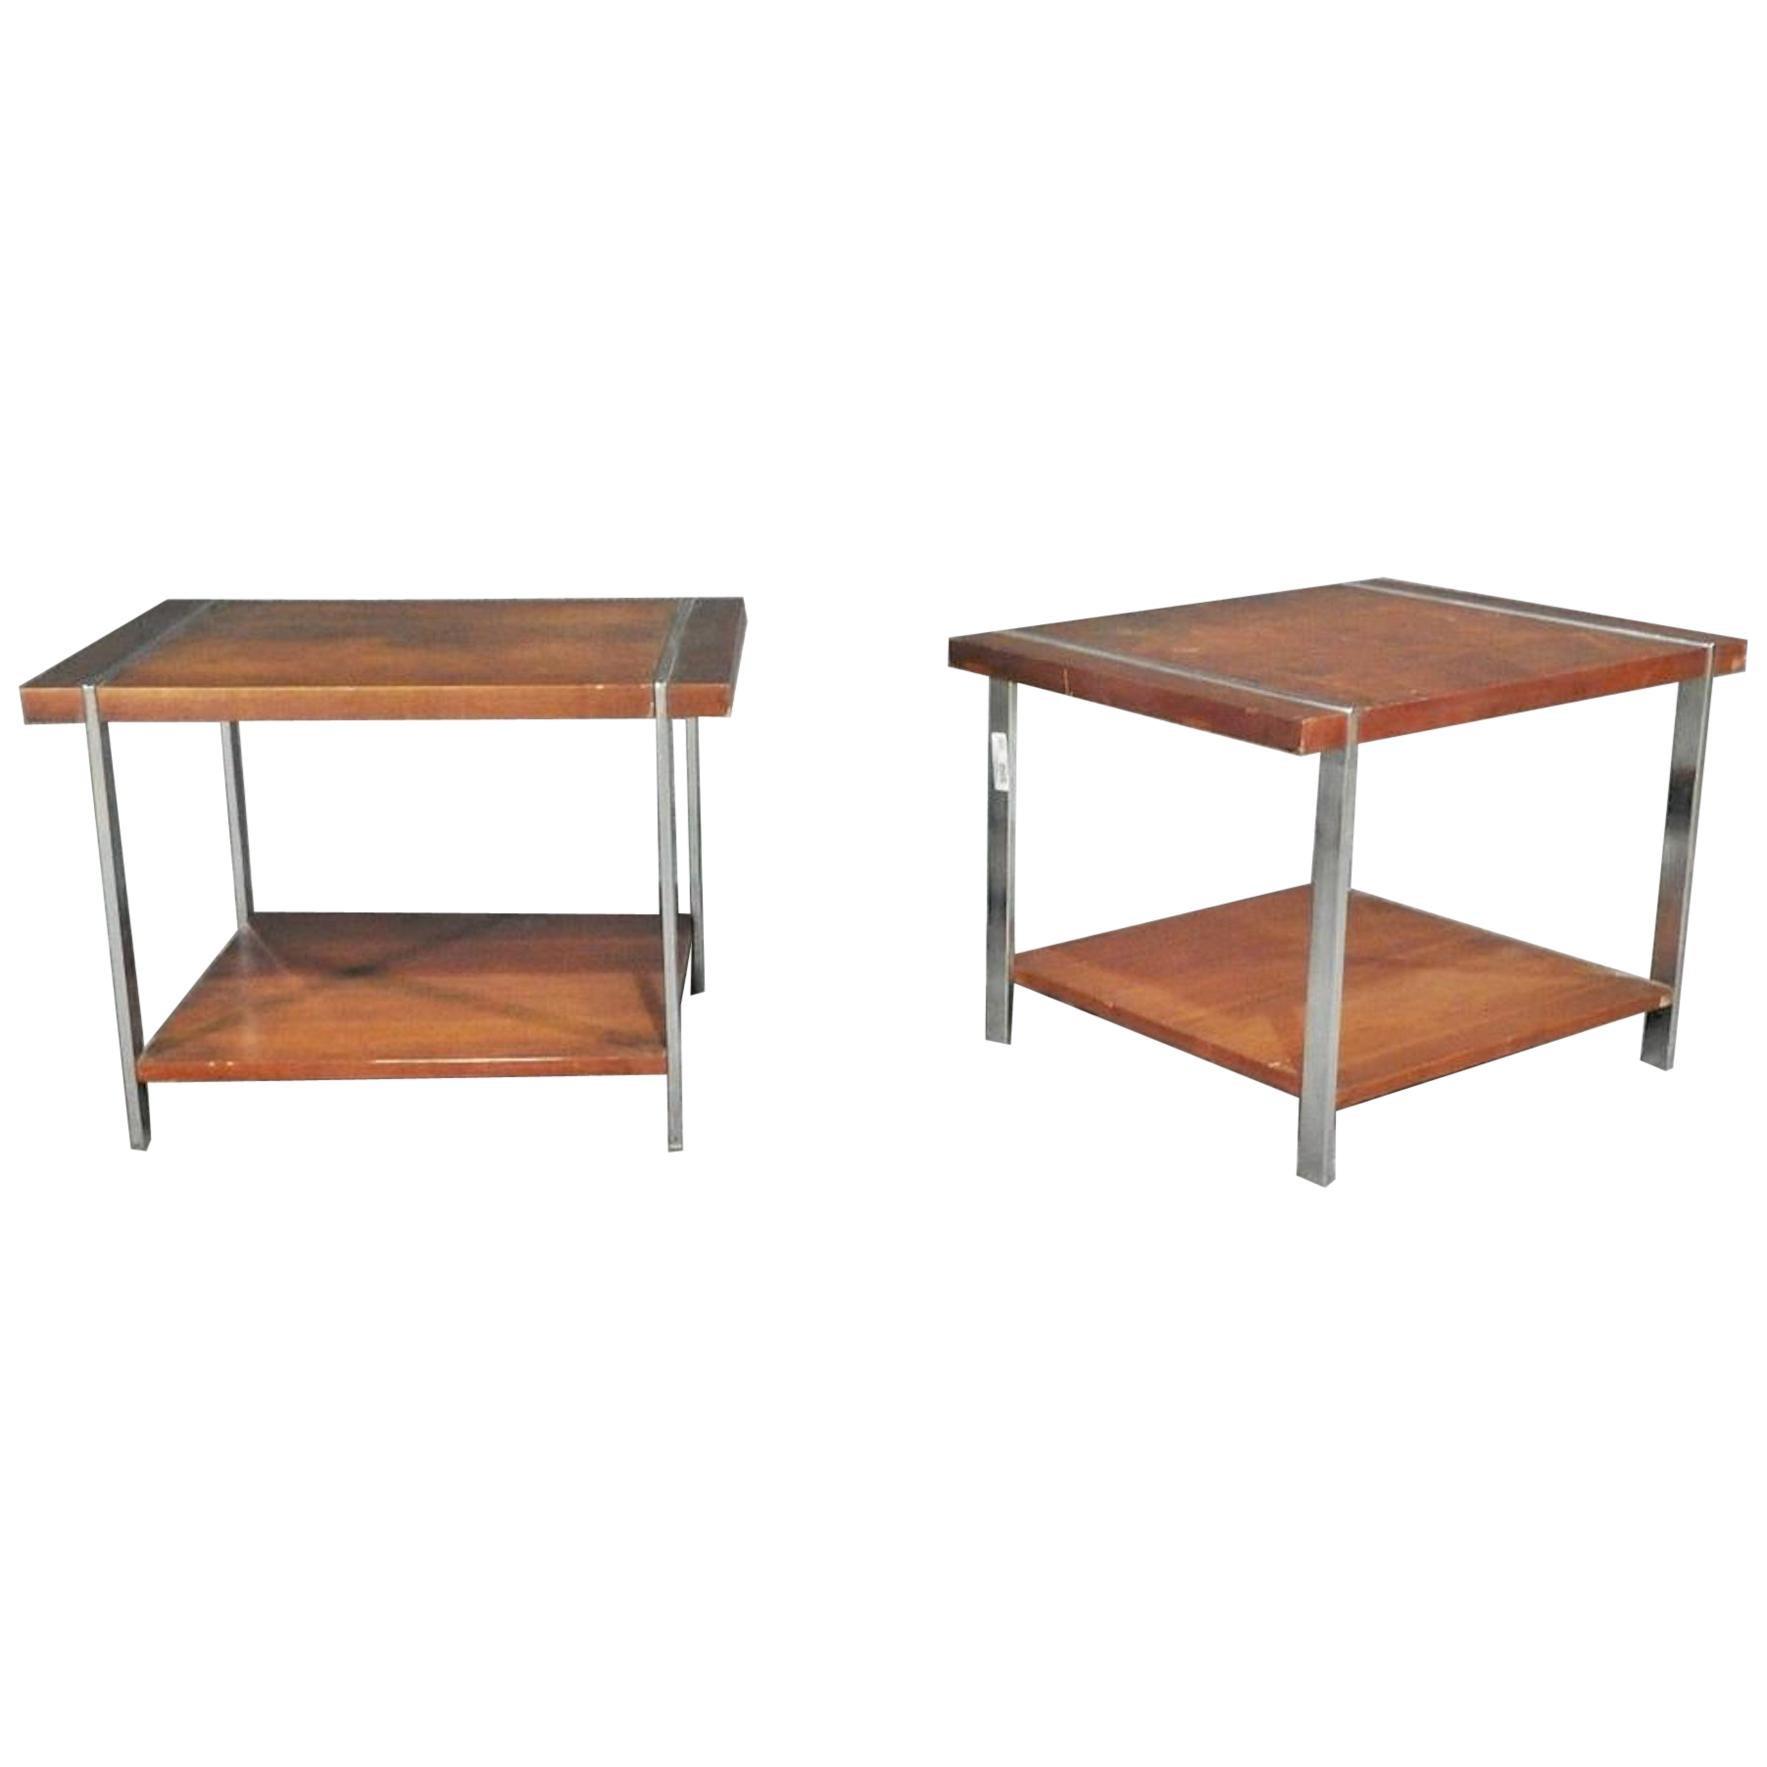 Pair of Midcentury Modern Side Tables